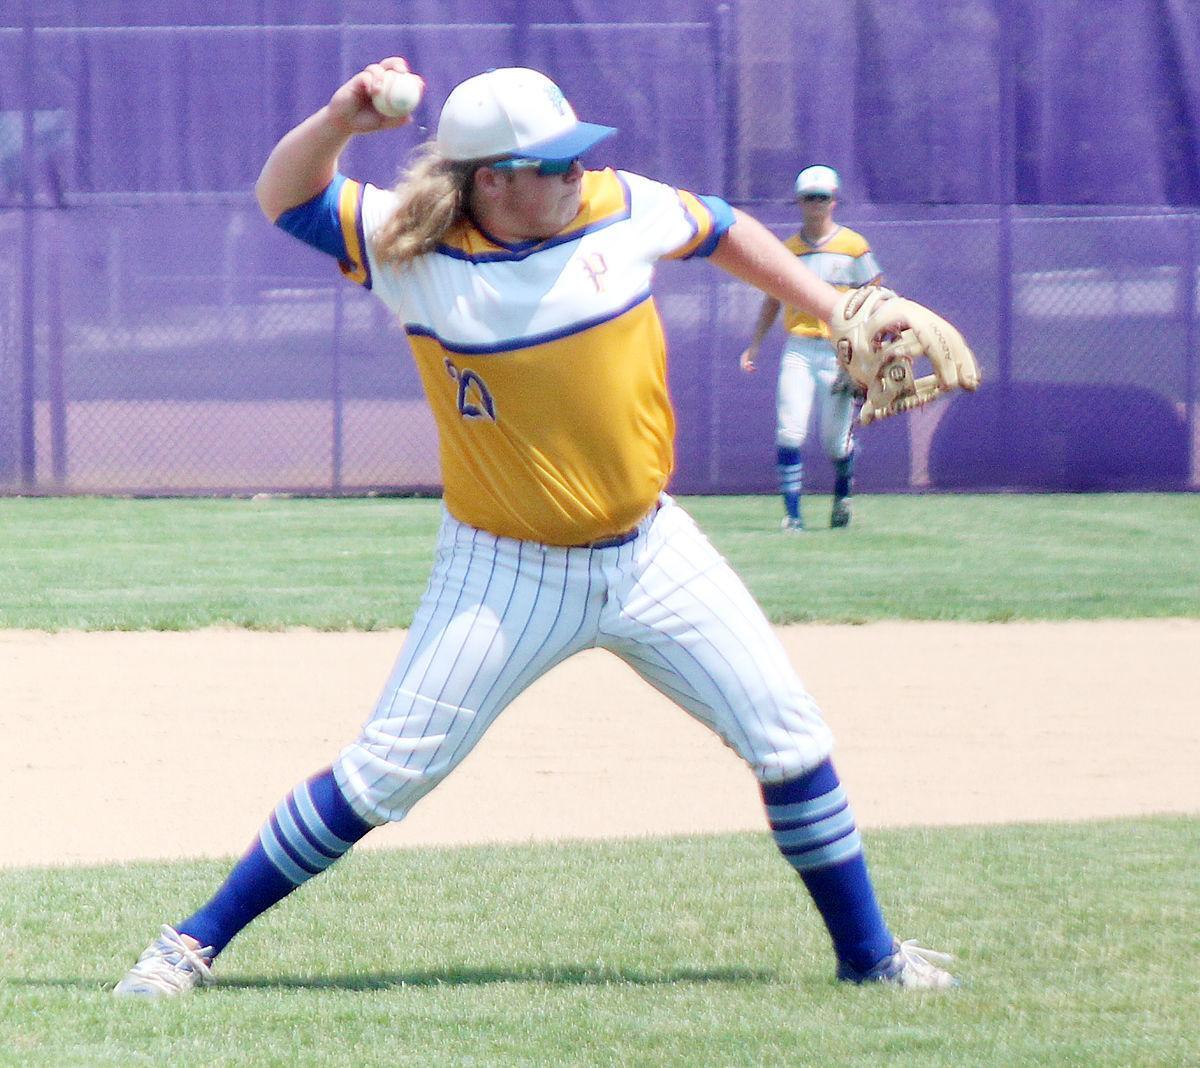 Ben Laney makes play at third base